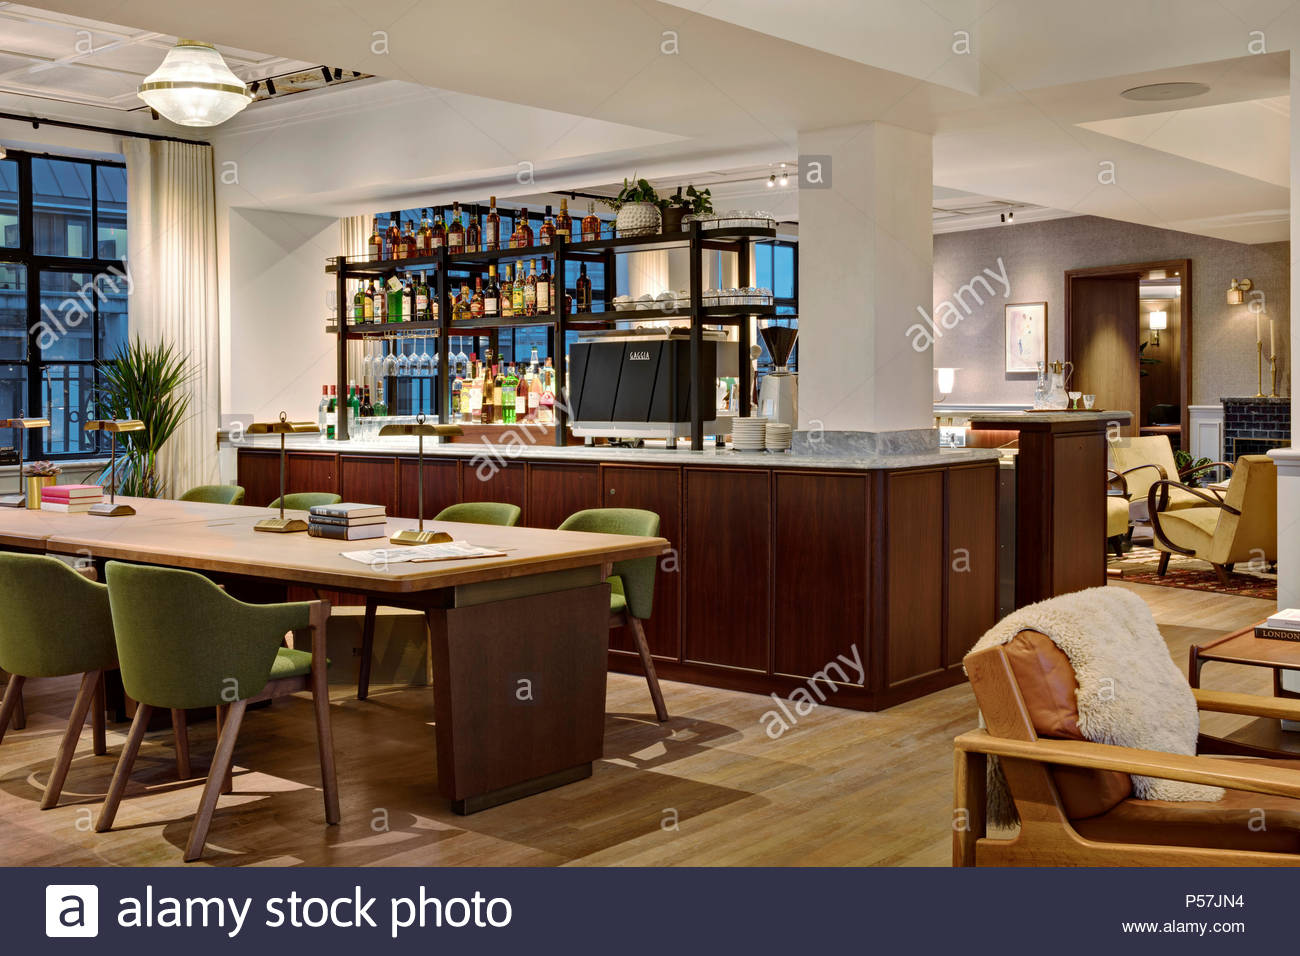 office kitchenette. Kitchenette Interior Of Mortimer House, Fitzrovia. Fitzrovia, United Kingdom. Office